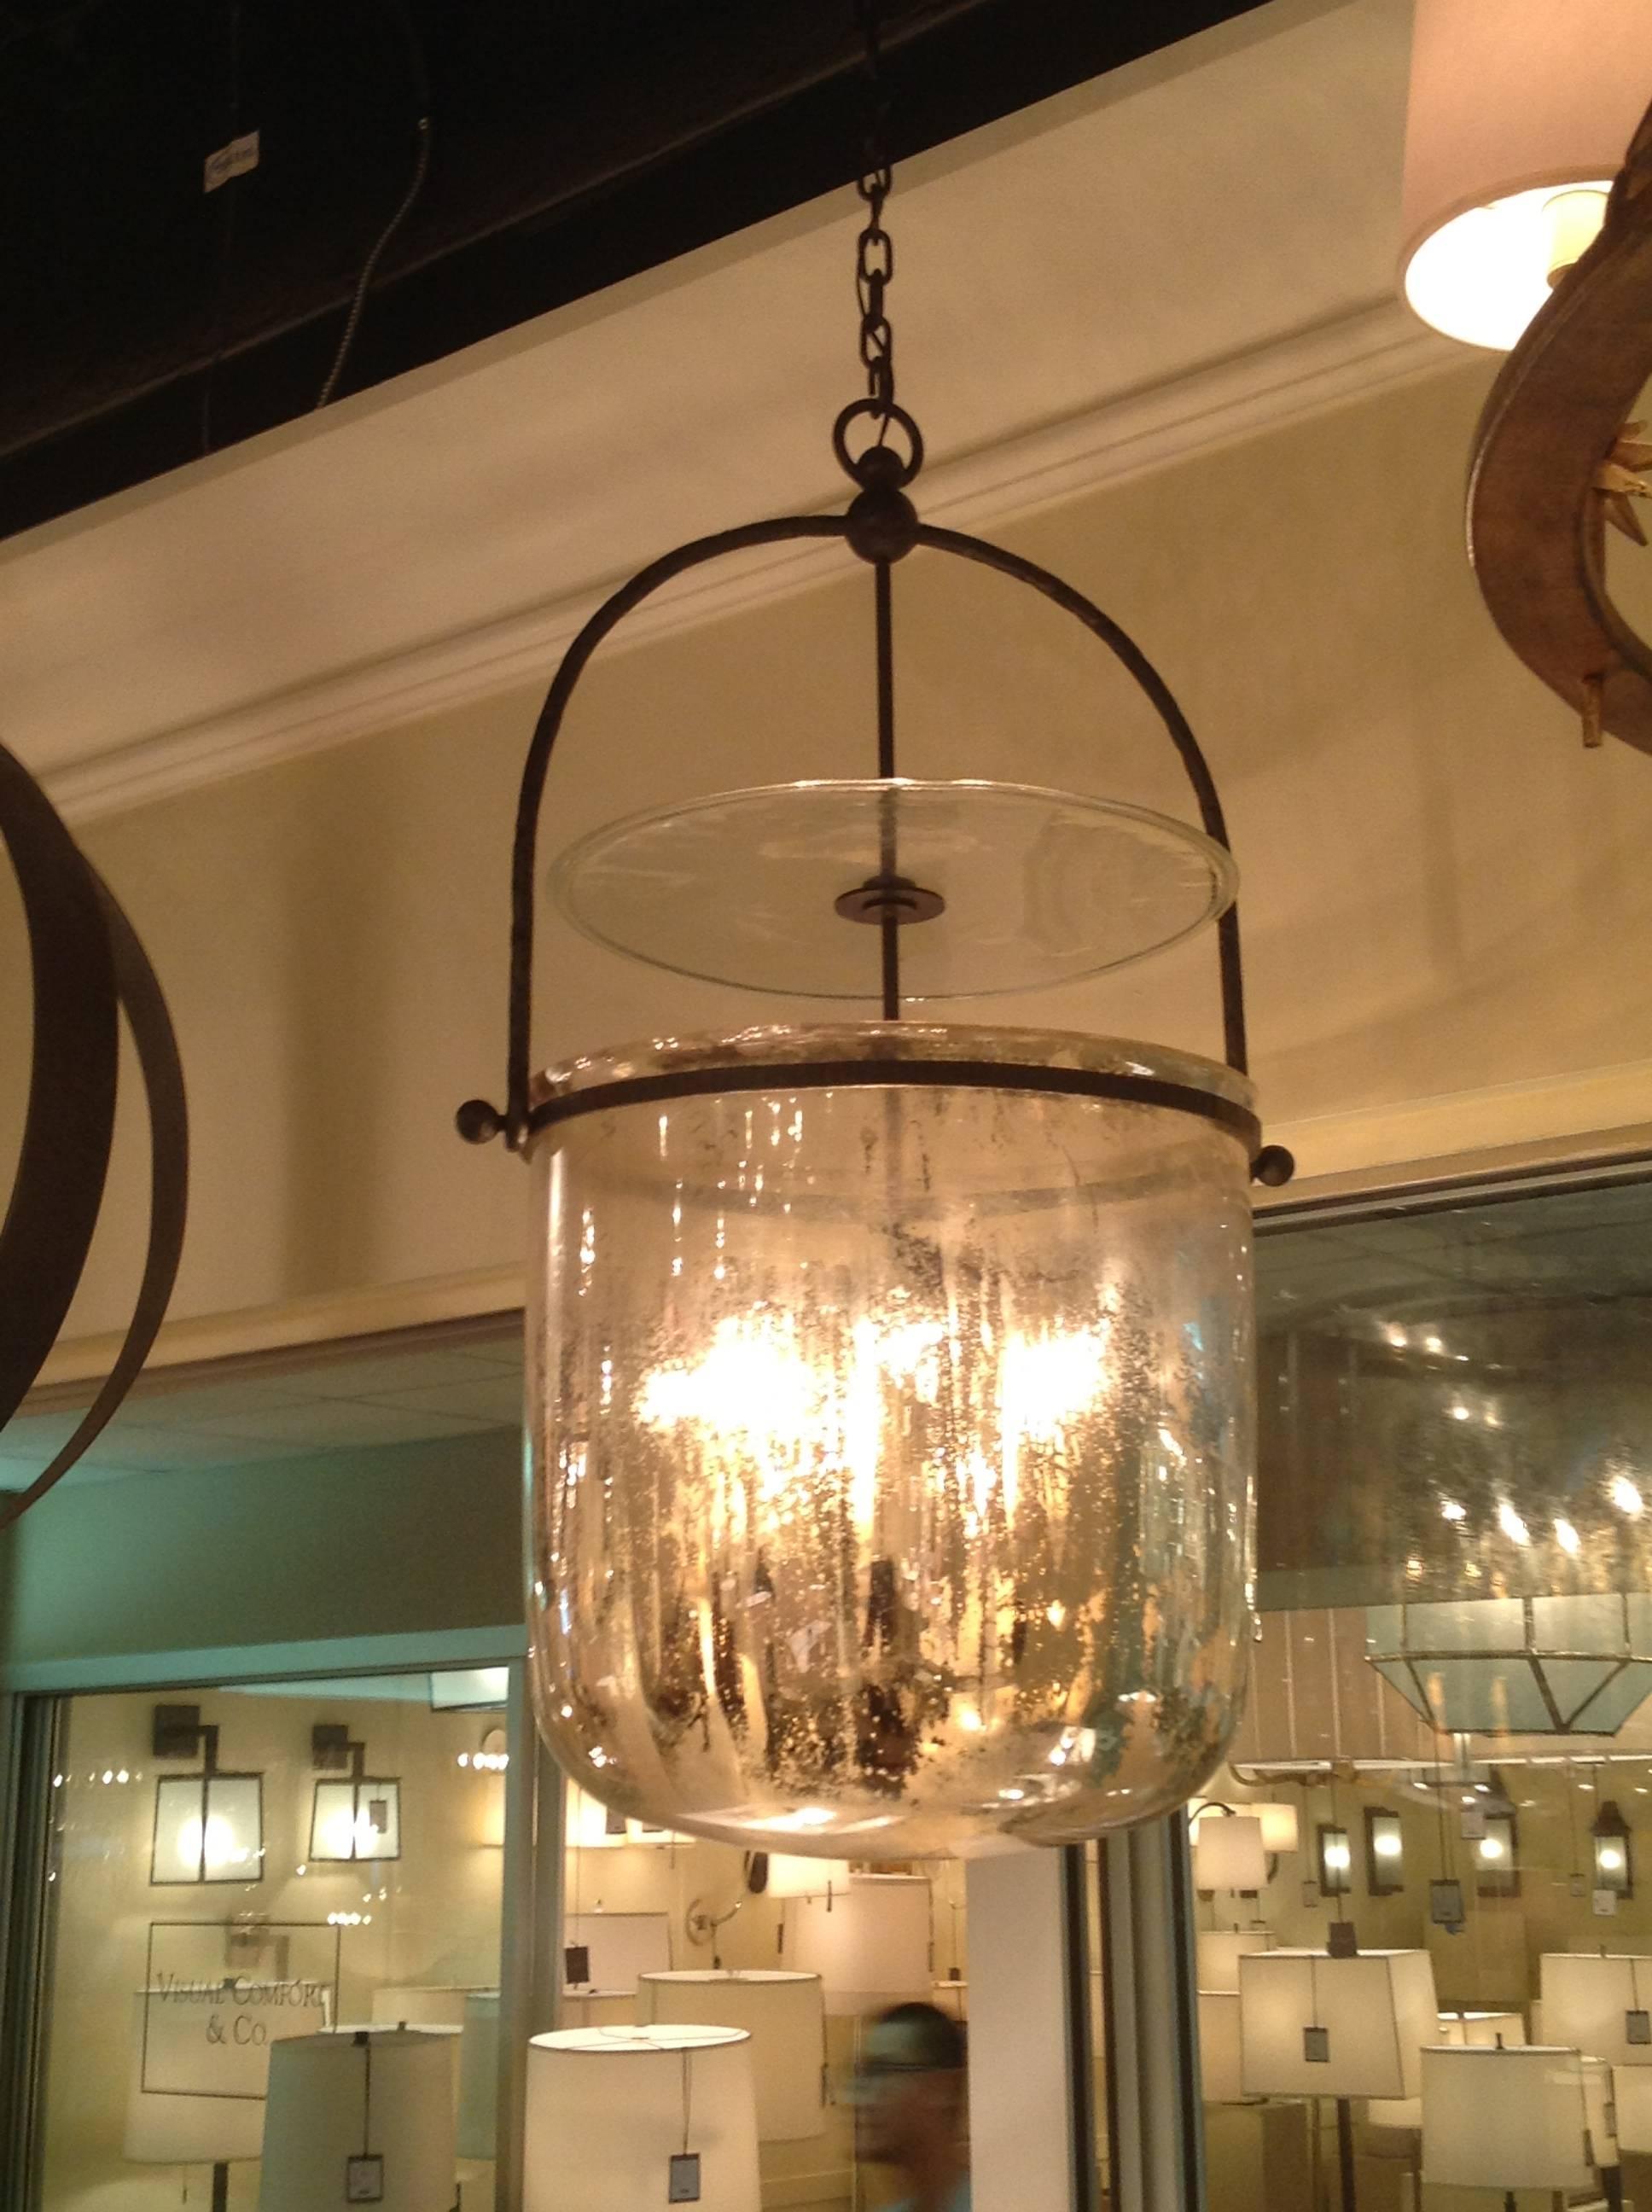 Lights: Antique Interior Lights Design Ideas With Mercury Glass inside Mercury Glass Lighting Fixtures (Image 9 of 15)